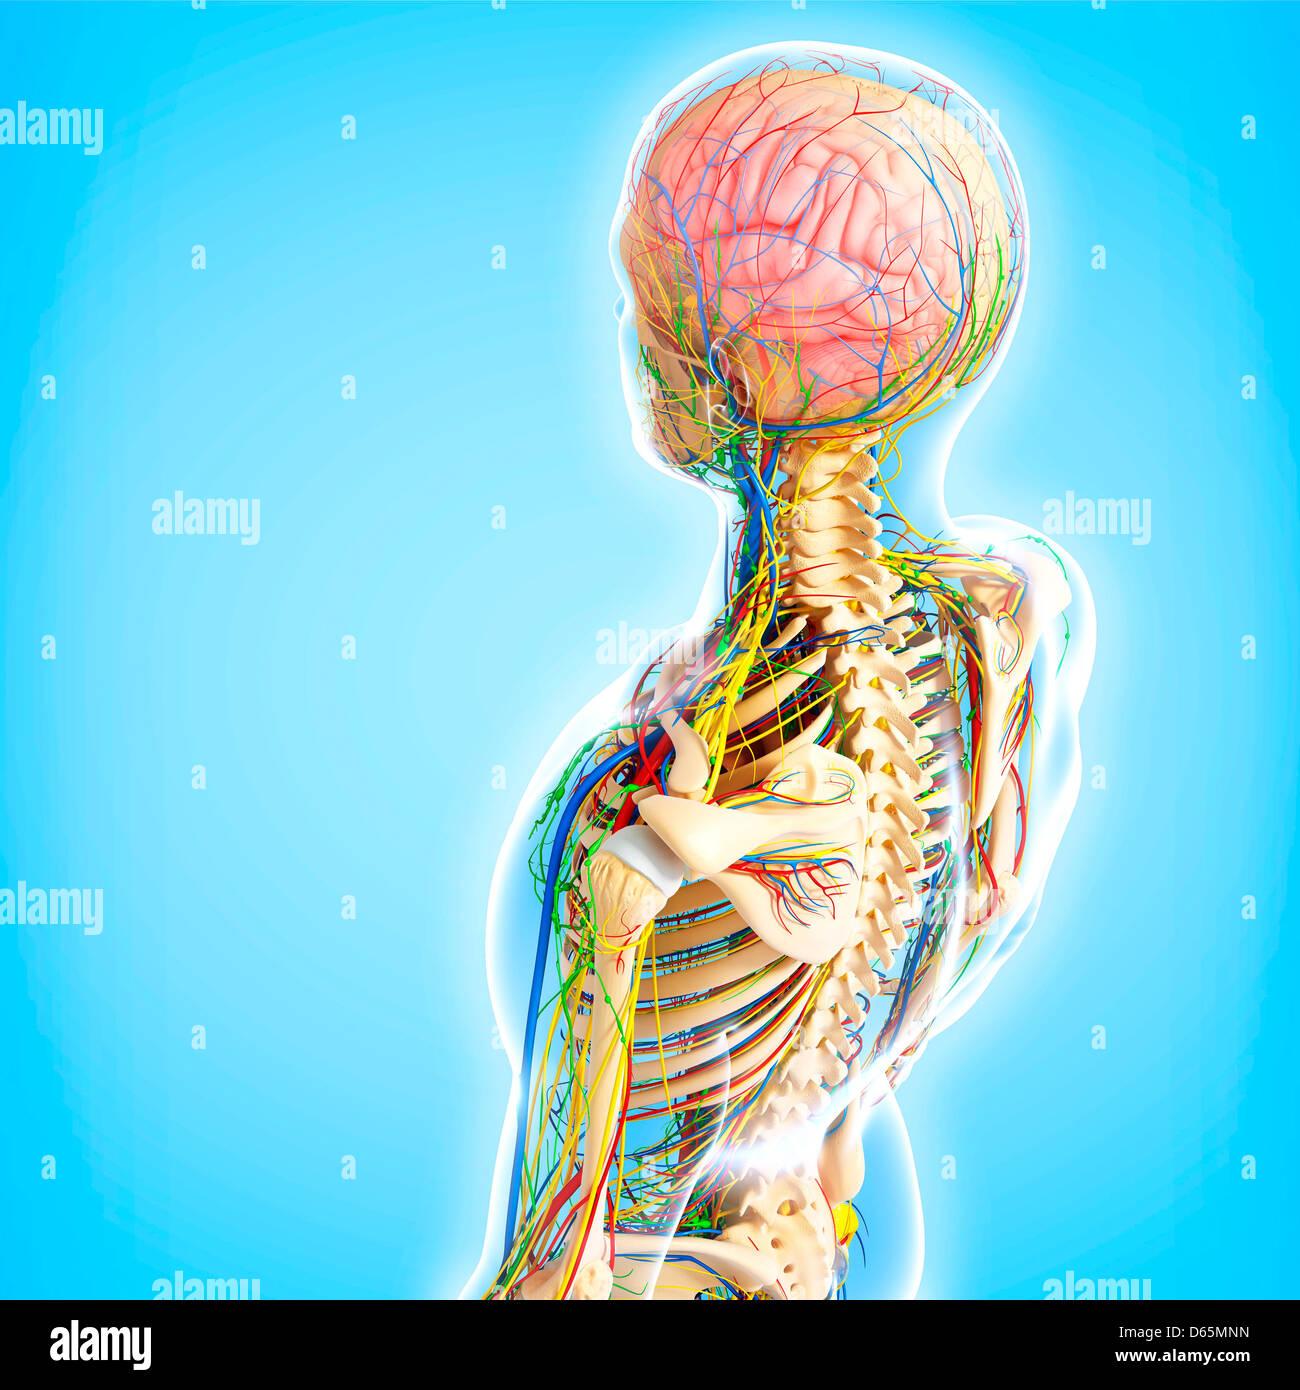 Upper Body Anatomy Artwork Stock Photo Royalty Free Image